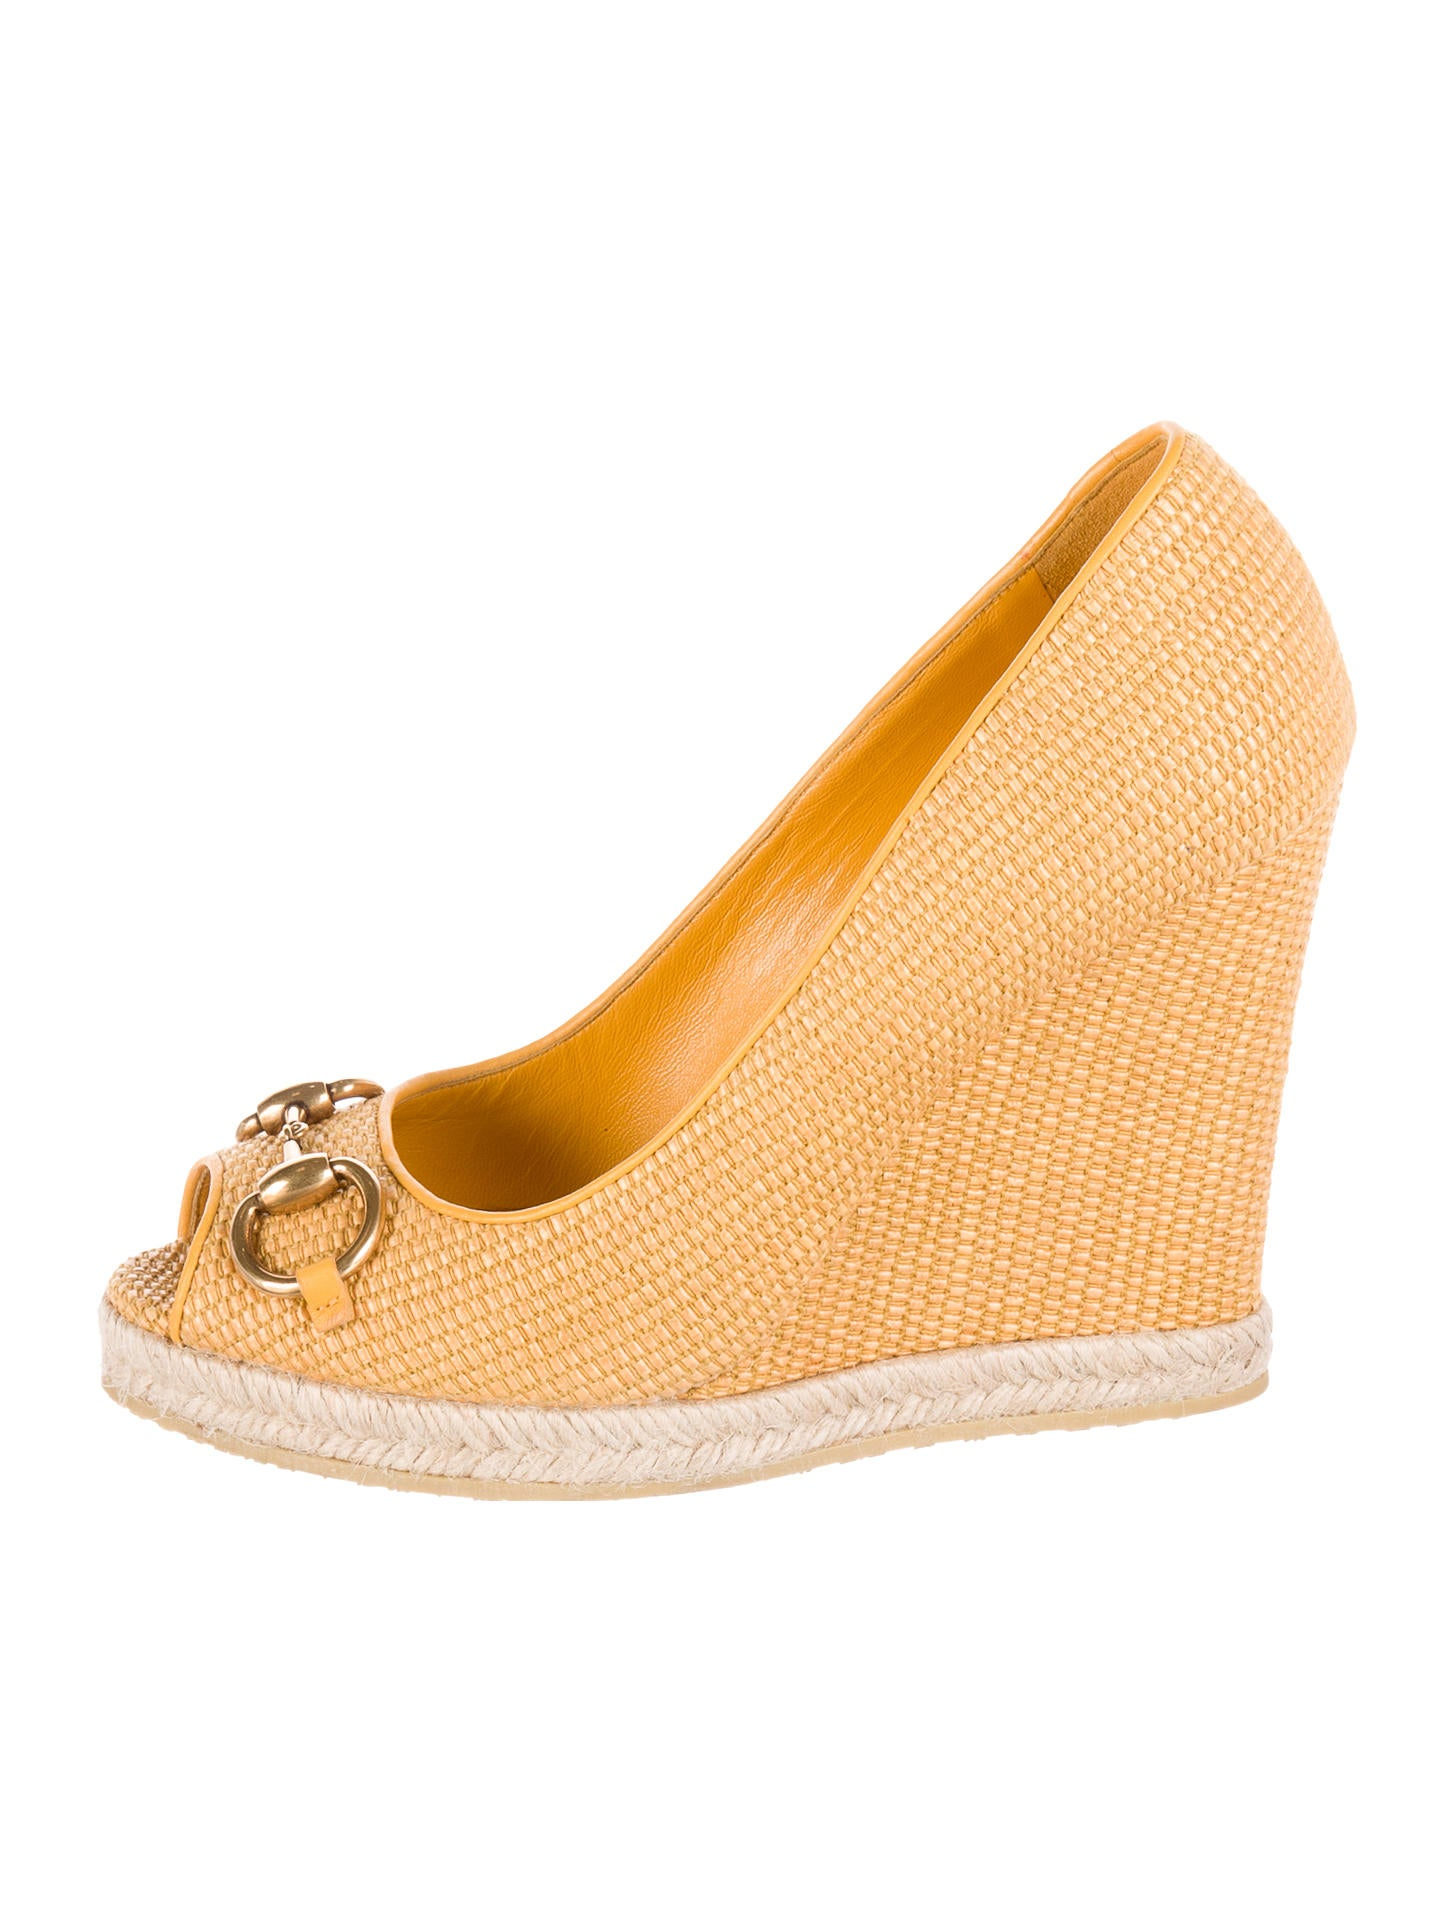 450155a30ff Gucci Raffia Horsebit Wedges - Shoes - GUC94705